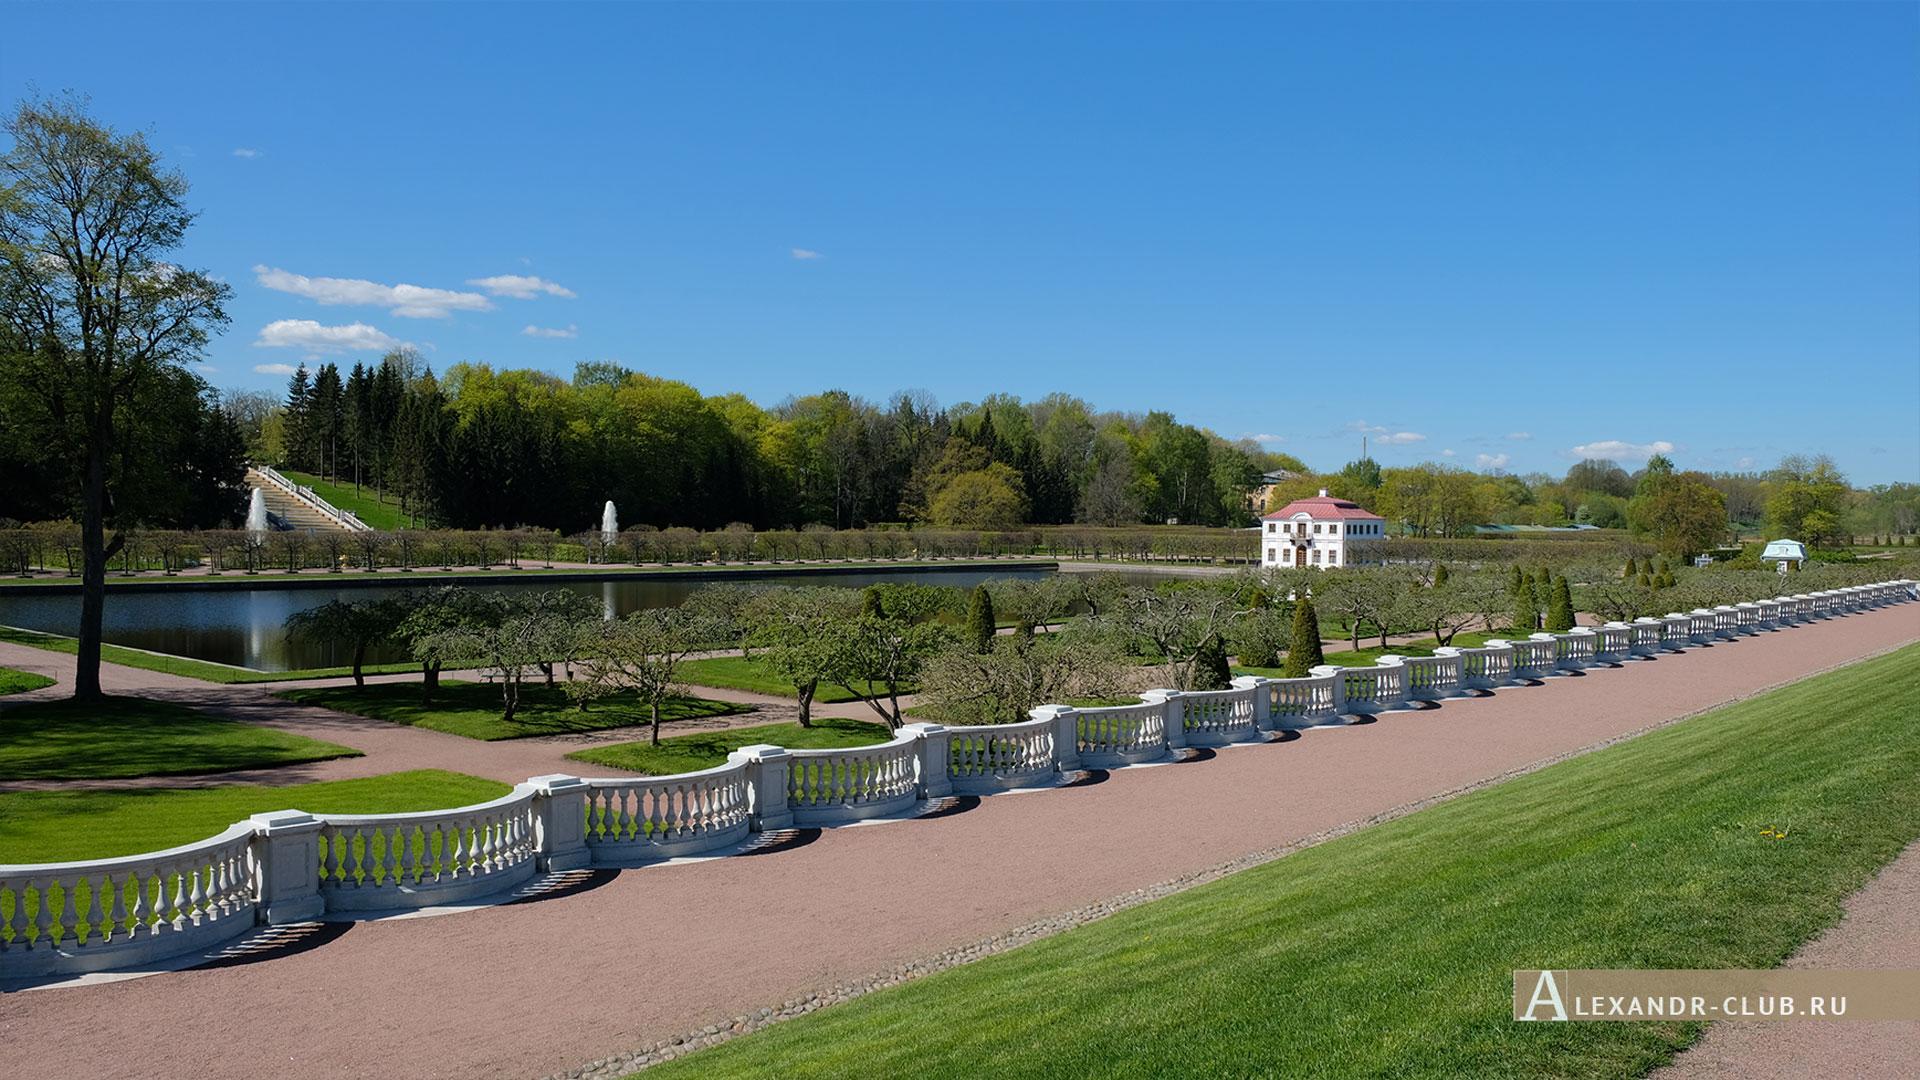 Петергоф, весна, Нижний парк, Марлинский вал, дворец Марли, каскад «Золотая гора»